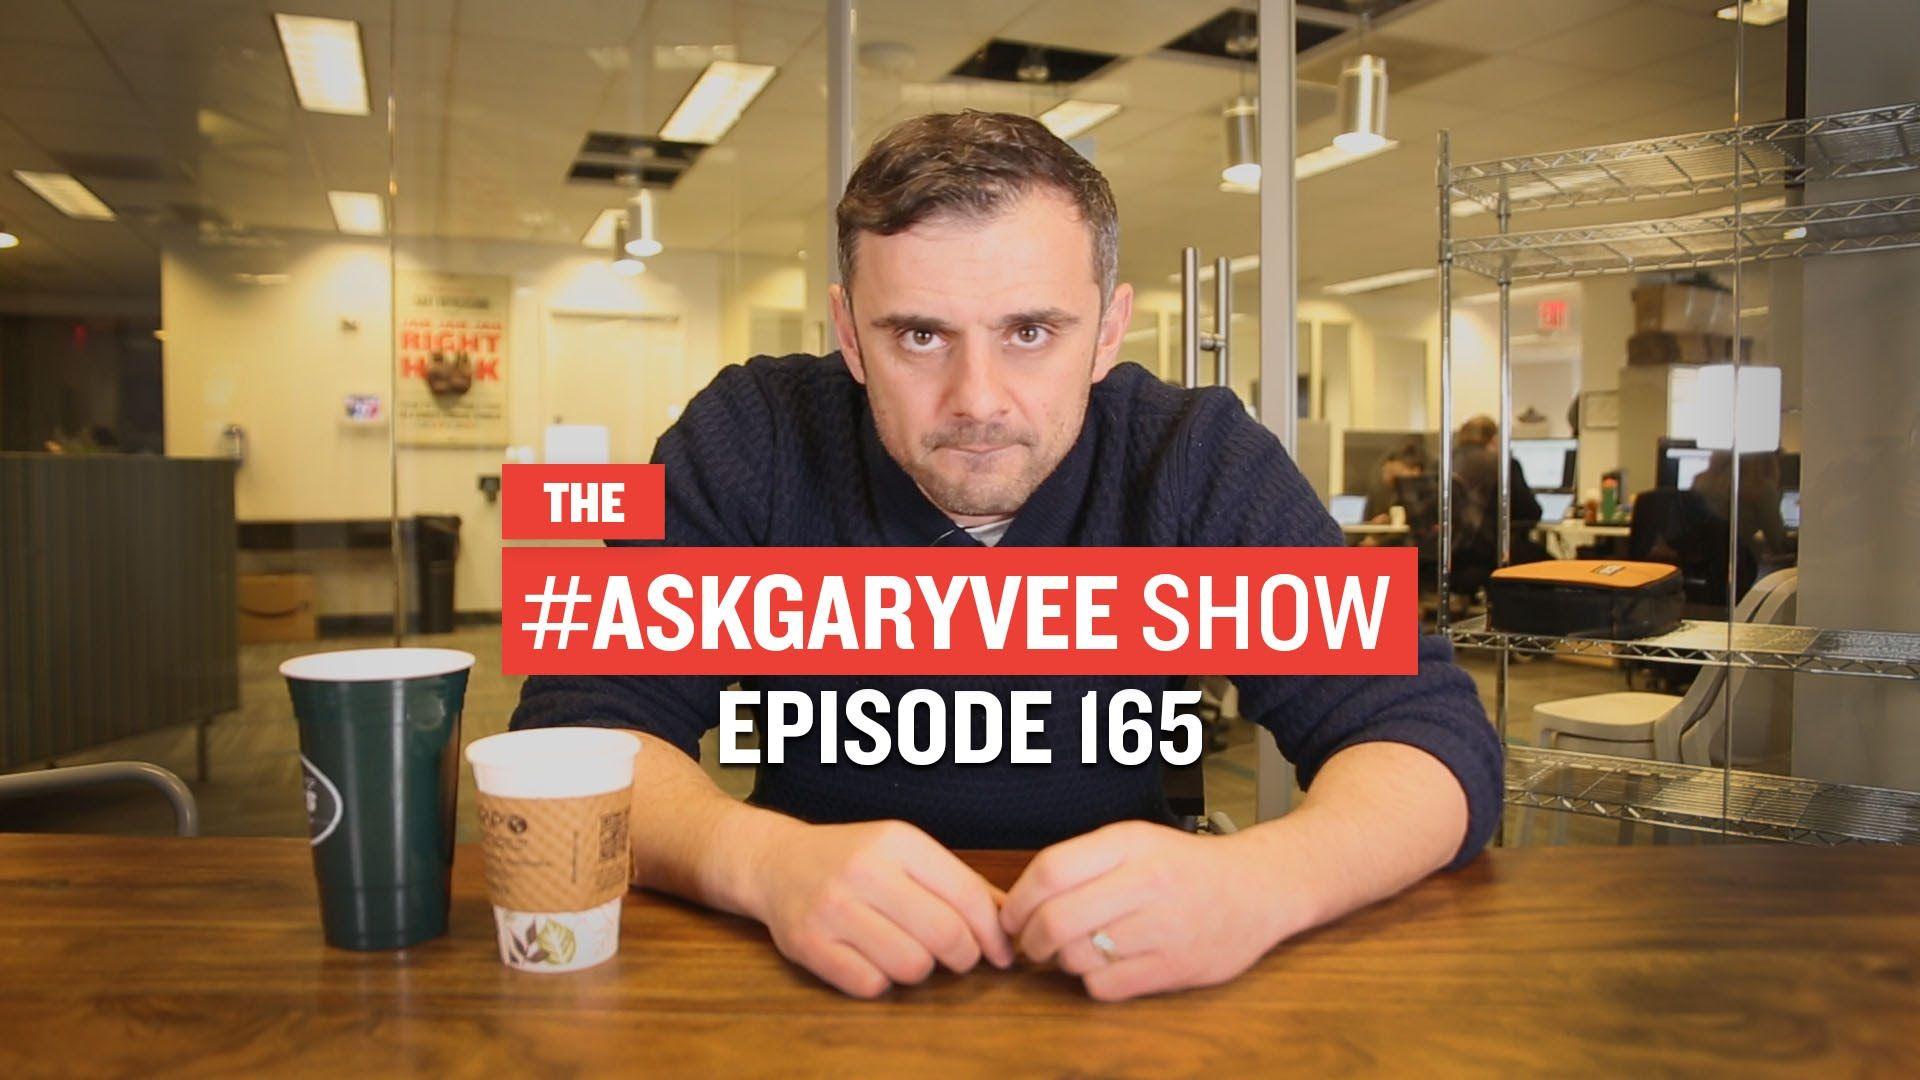 AskGaryVee Episode 165 Billboards, Production Capacity